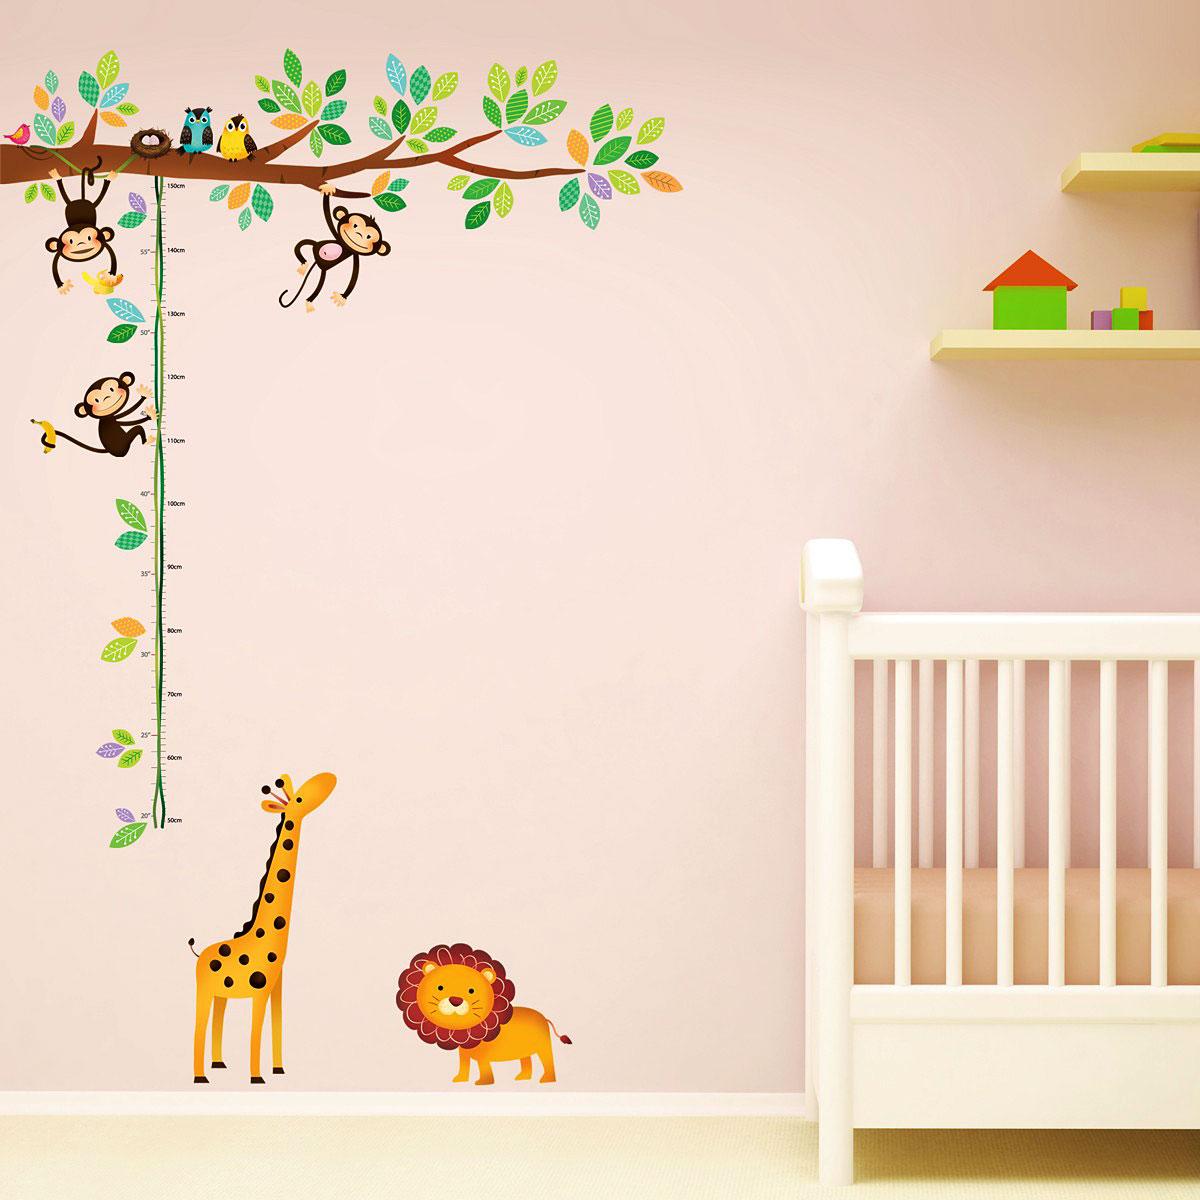 messlatte wandsticker 3 kleine affen mit l we kinderzimmer babyzimmer wandtattoo ebay. Black Bedroom Furniture Sets. Home Design Ideas